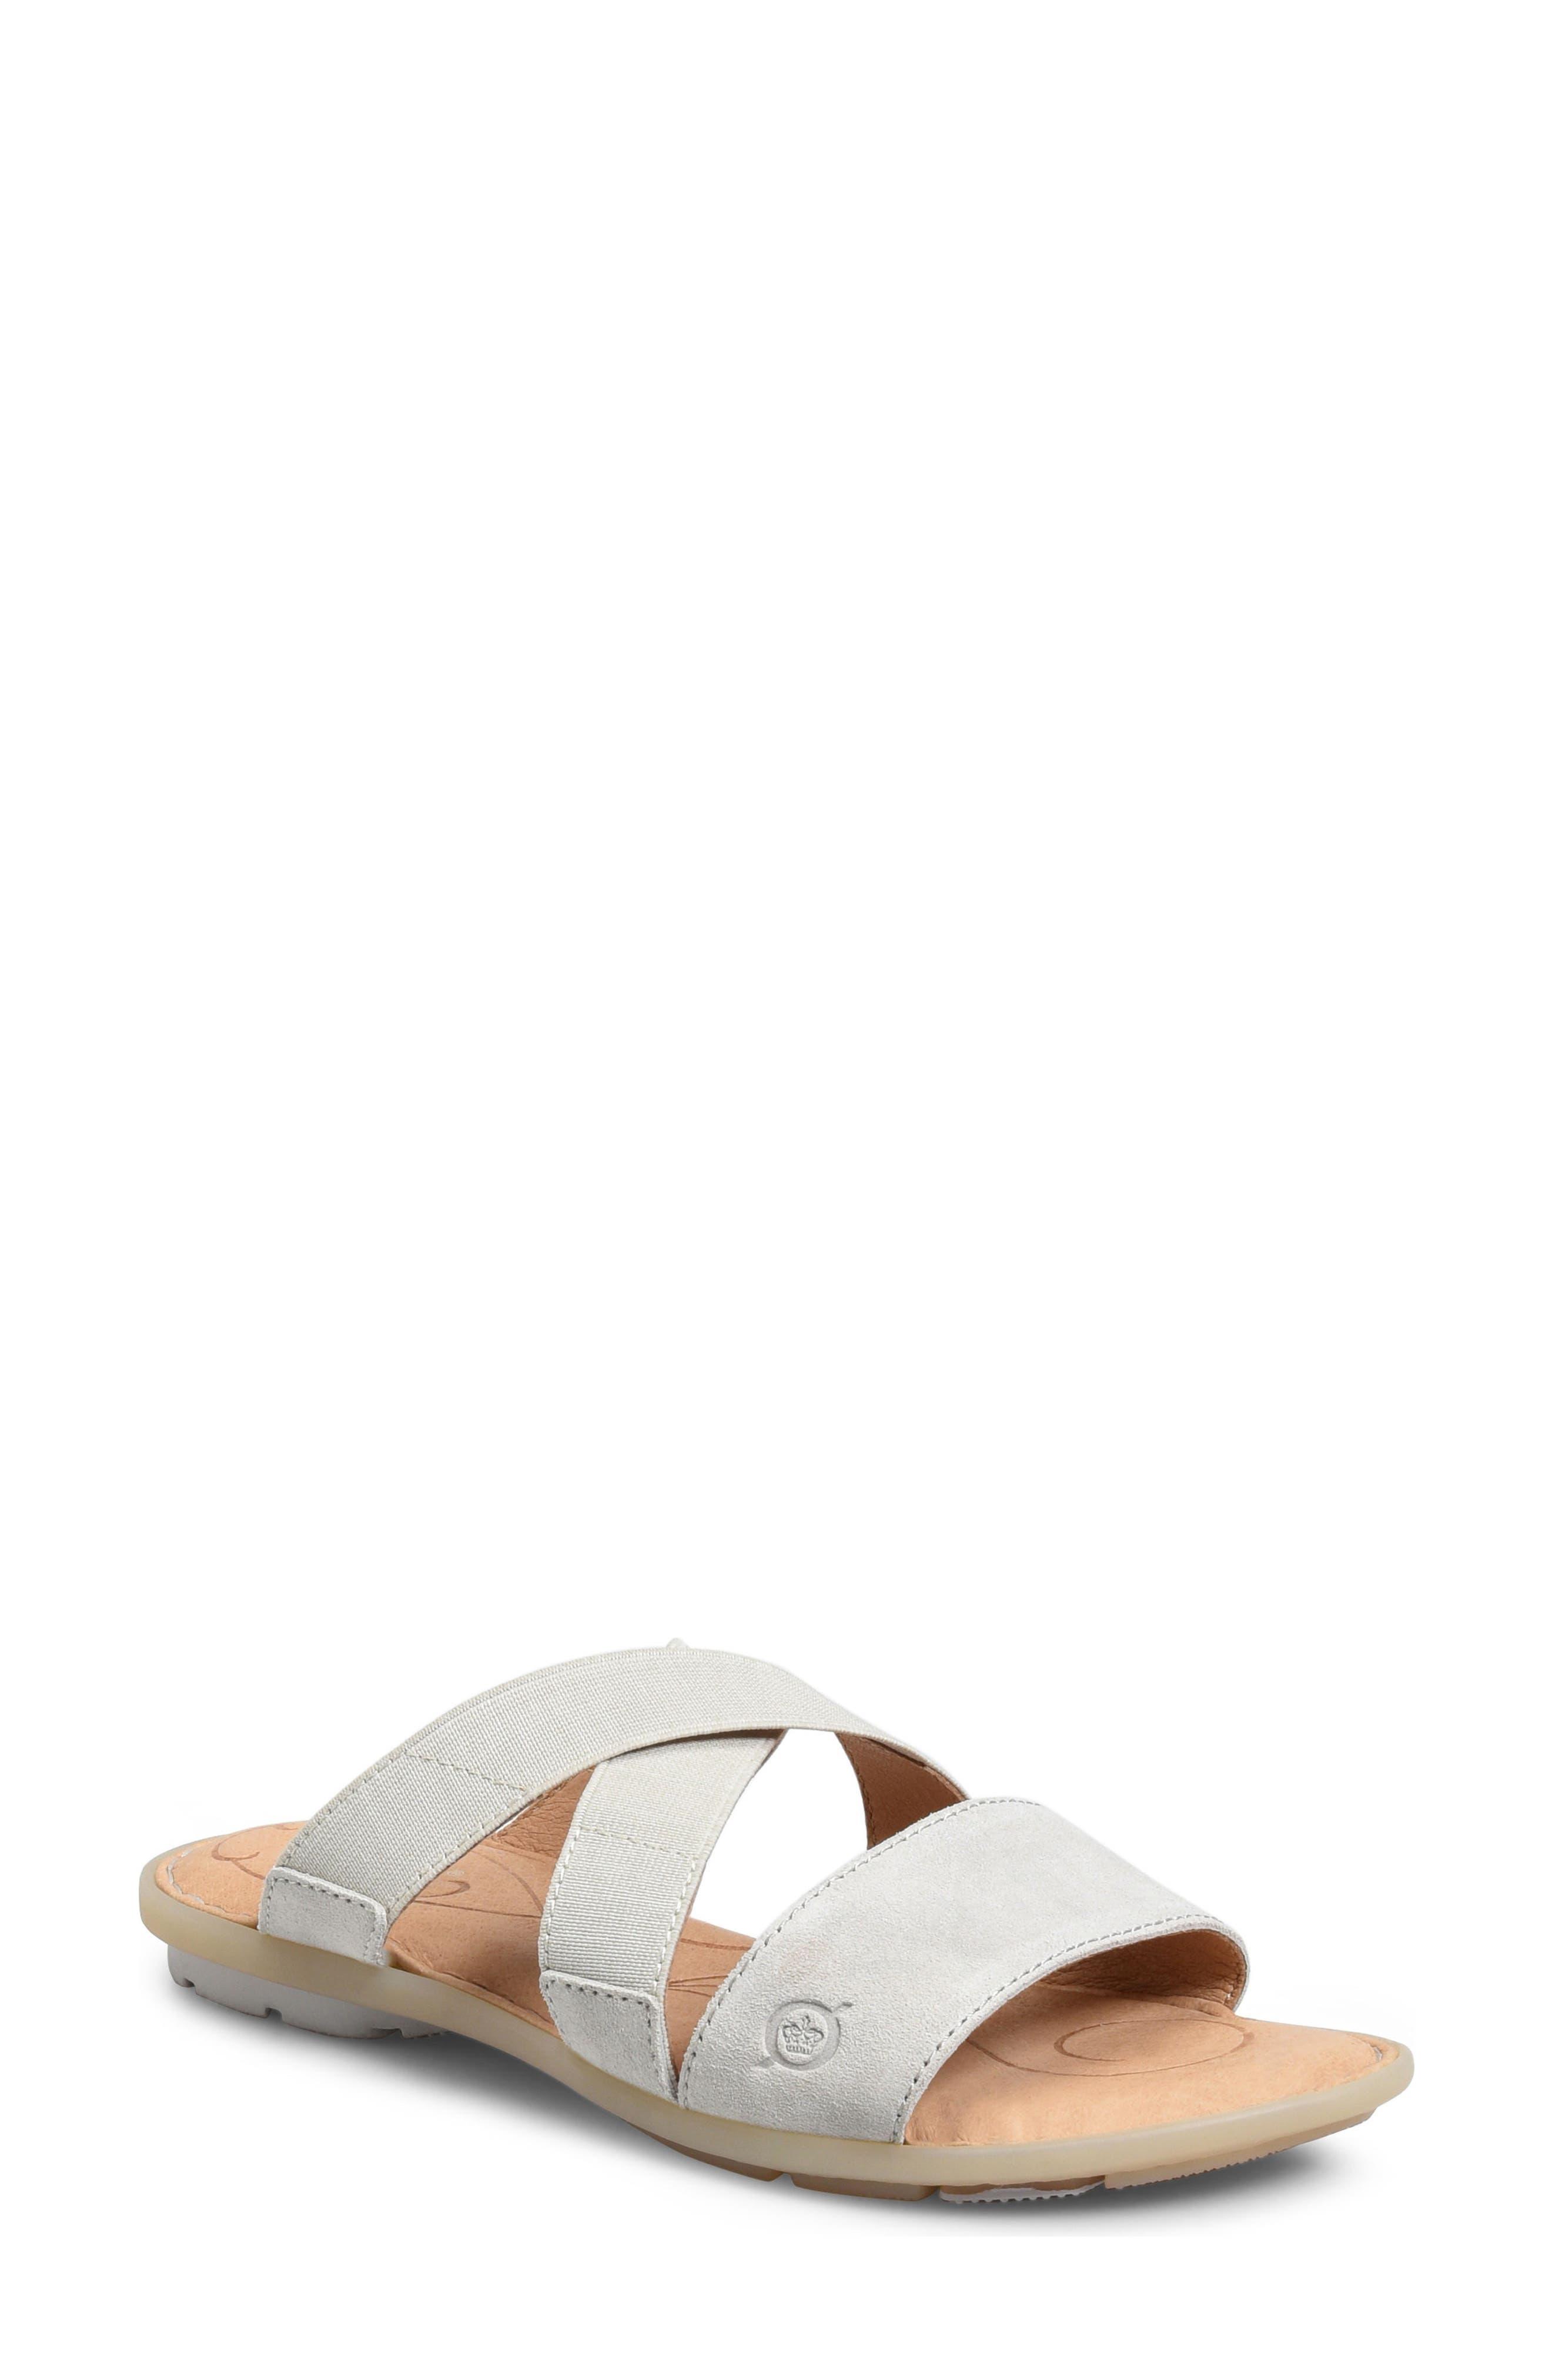 Børn Tidore Slide Sandal (Women)